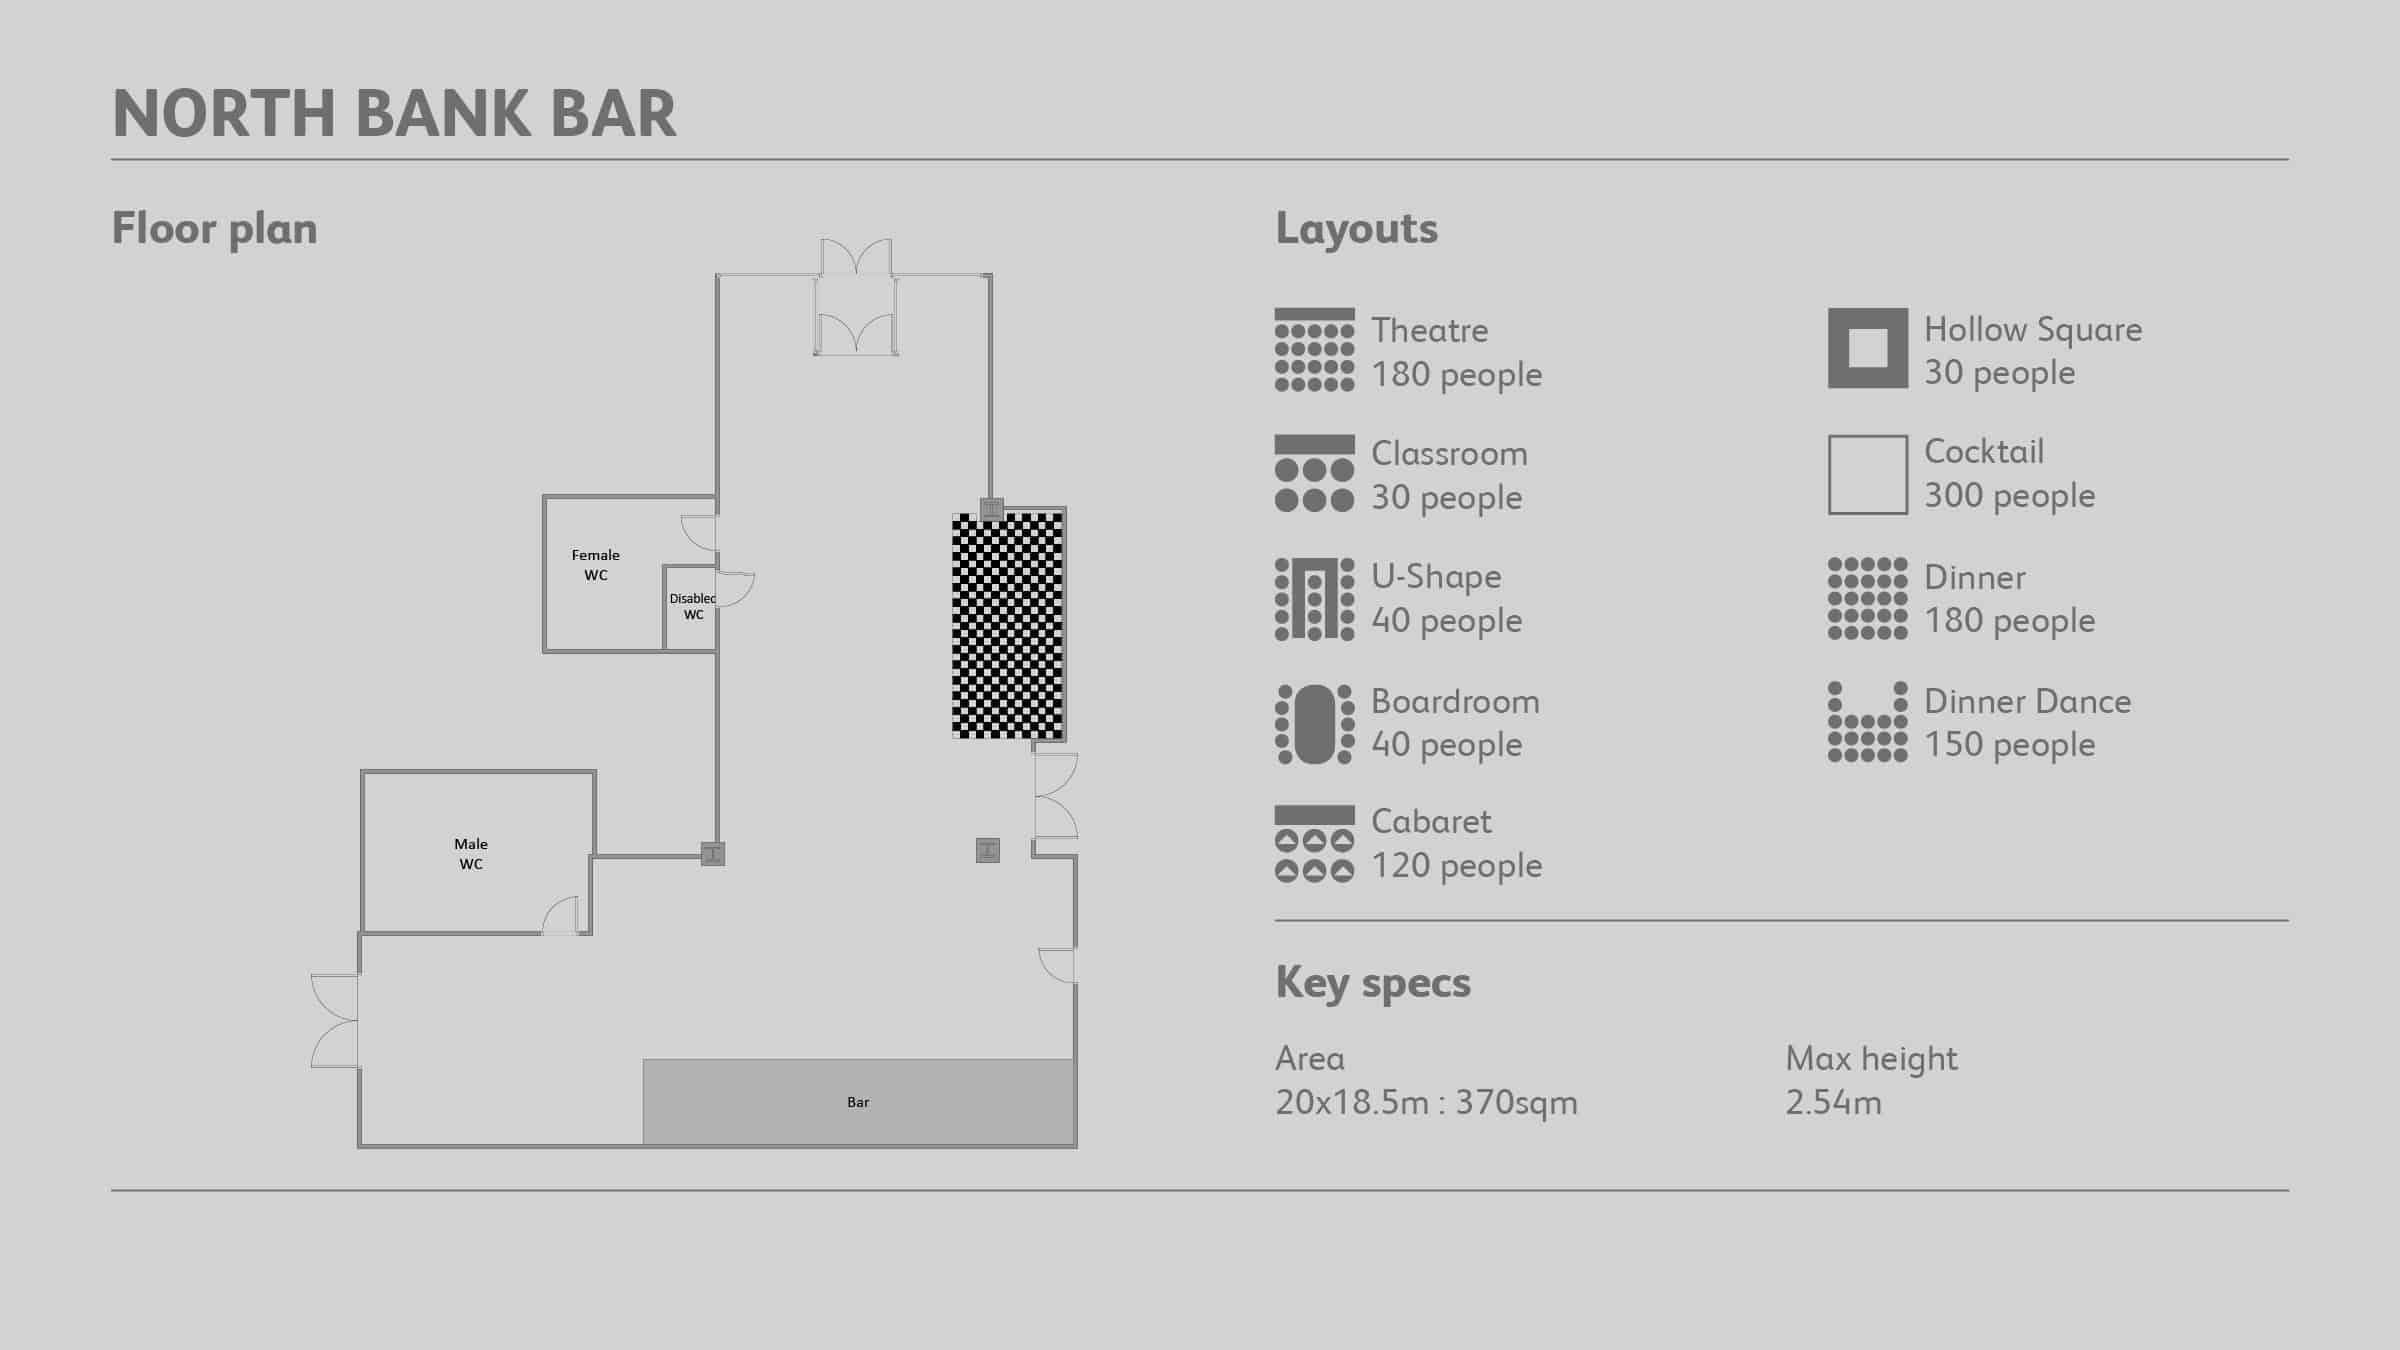 Floor plan of North Bank Bar